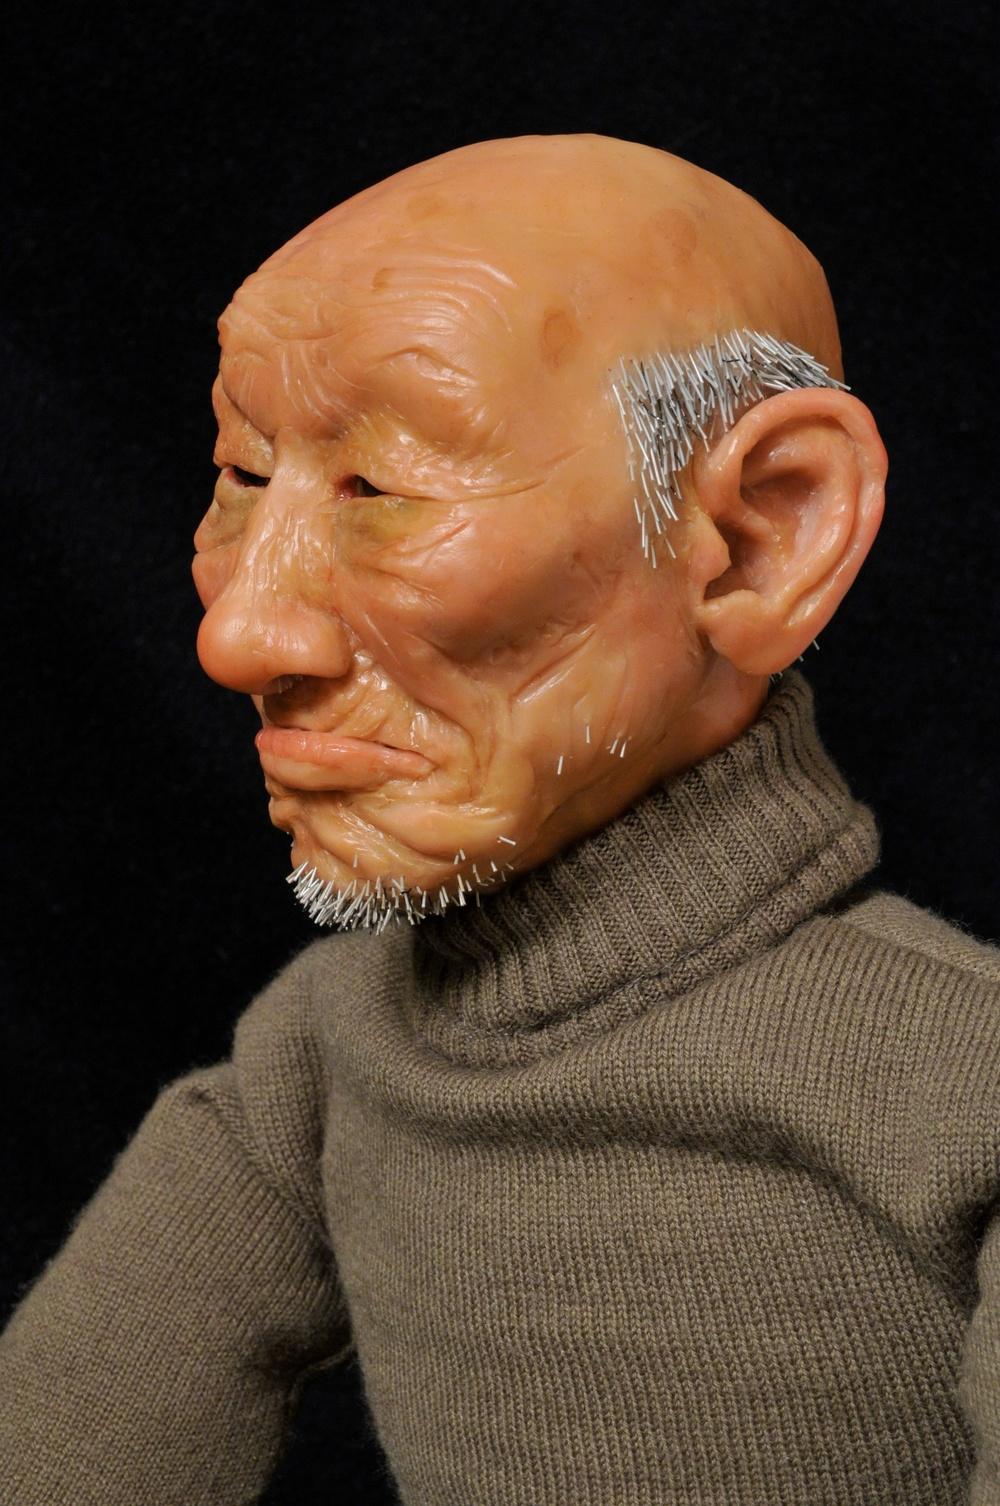 Image 6 Yoshi Profile.jpg